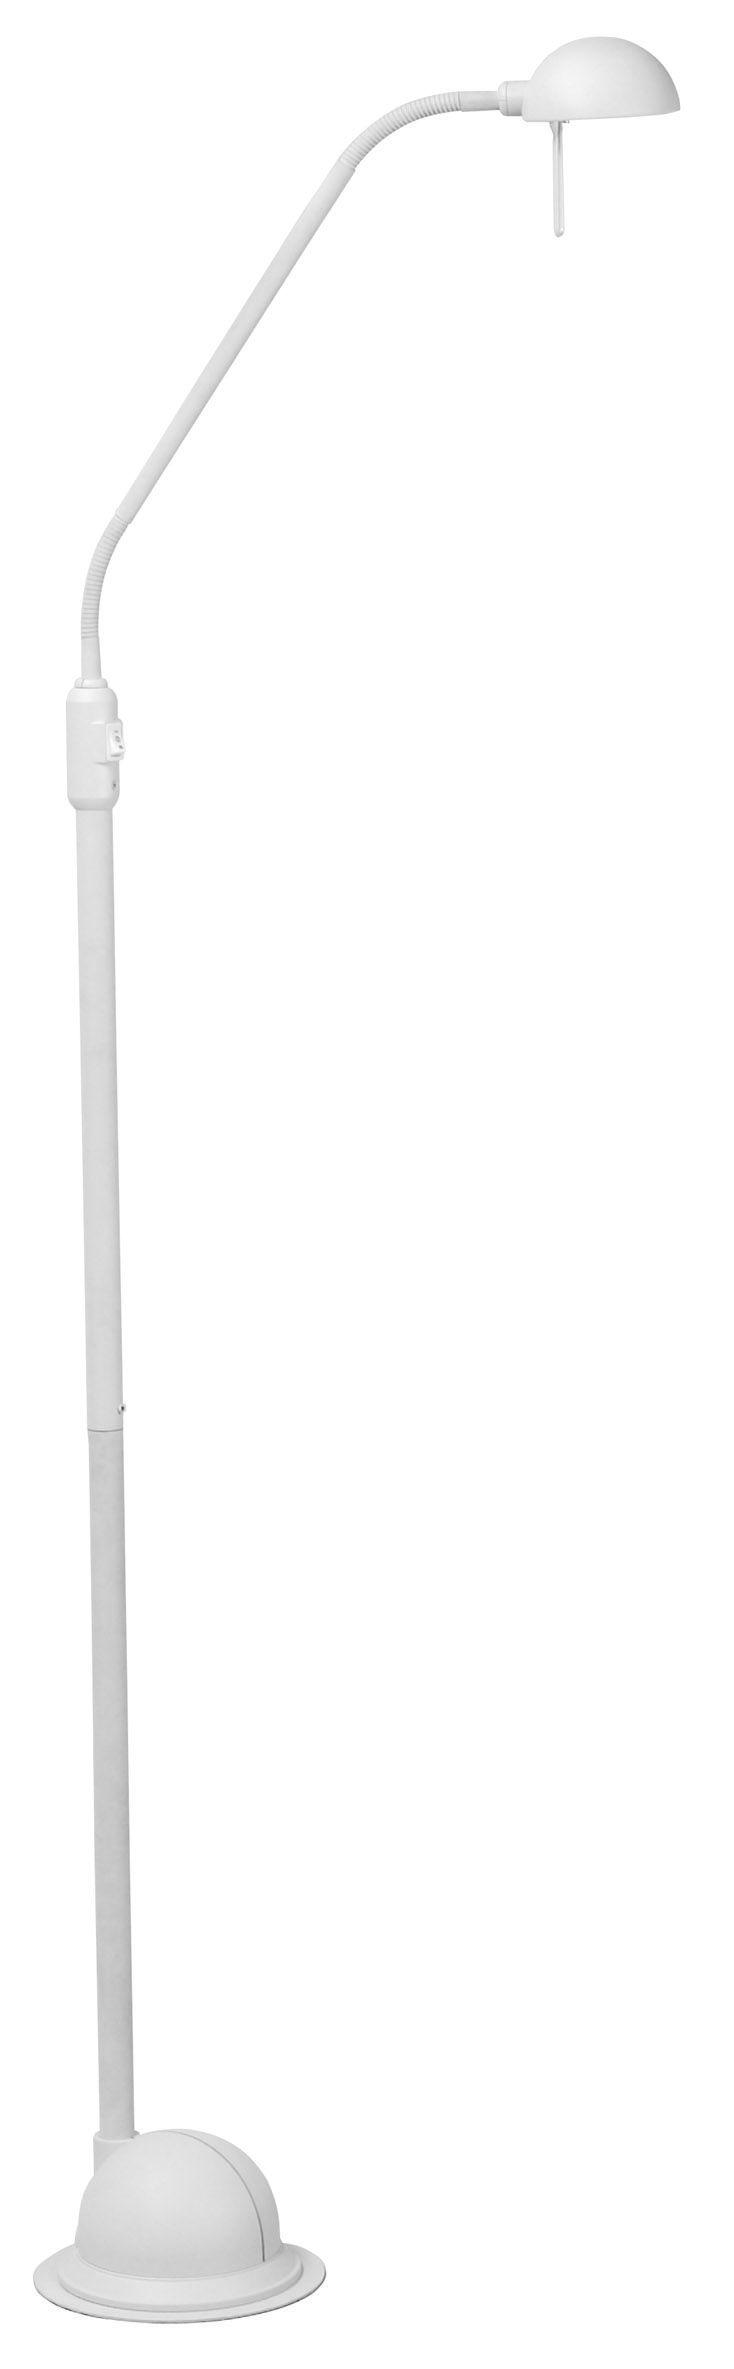 Rove Floor Lamp in White